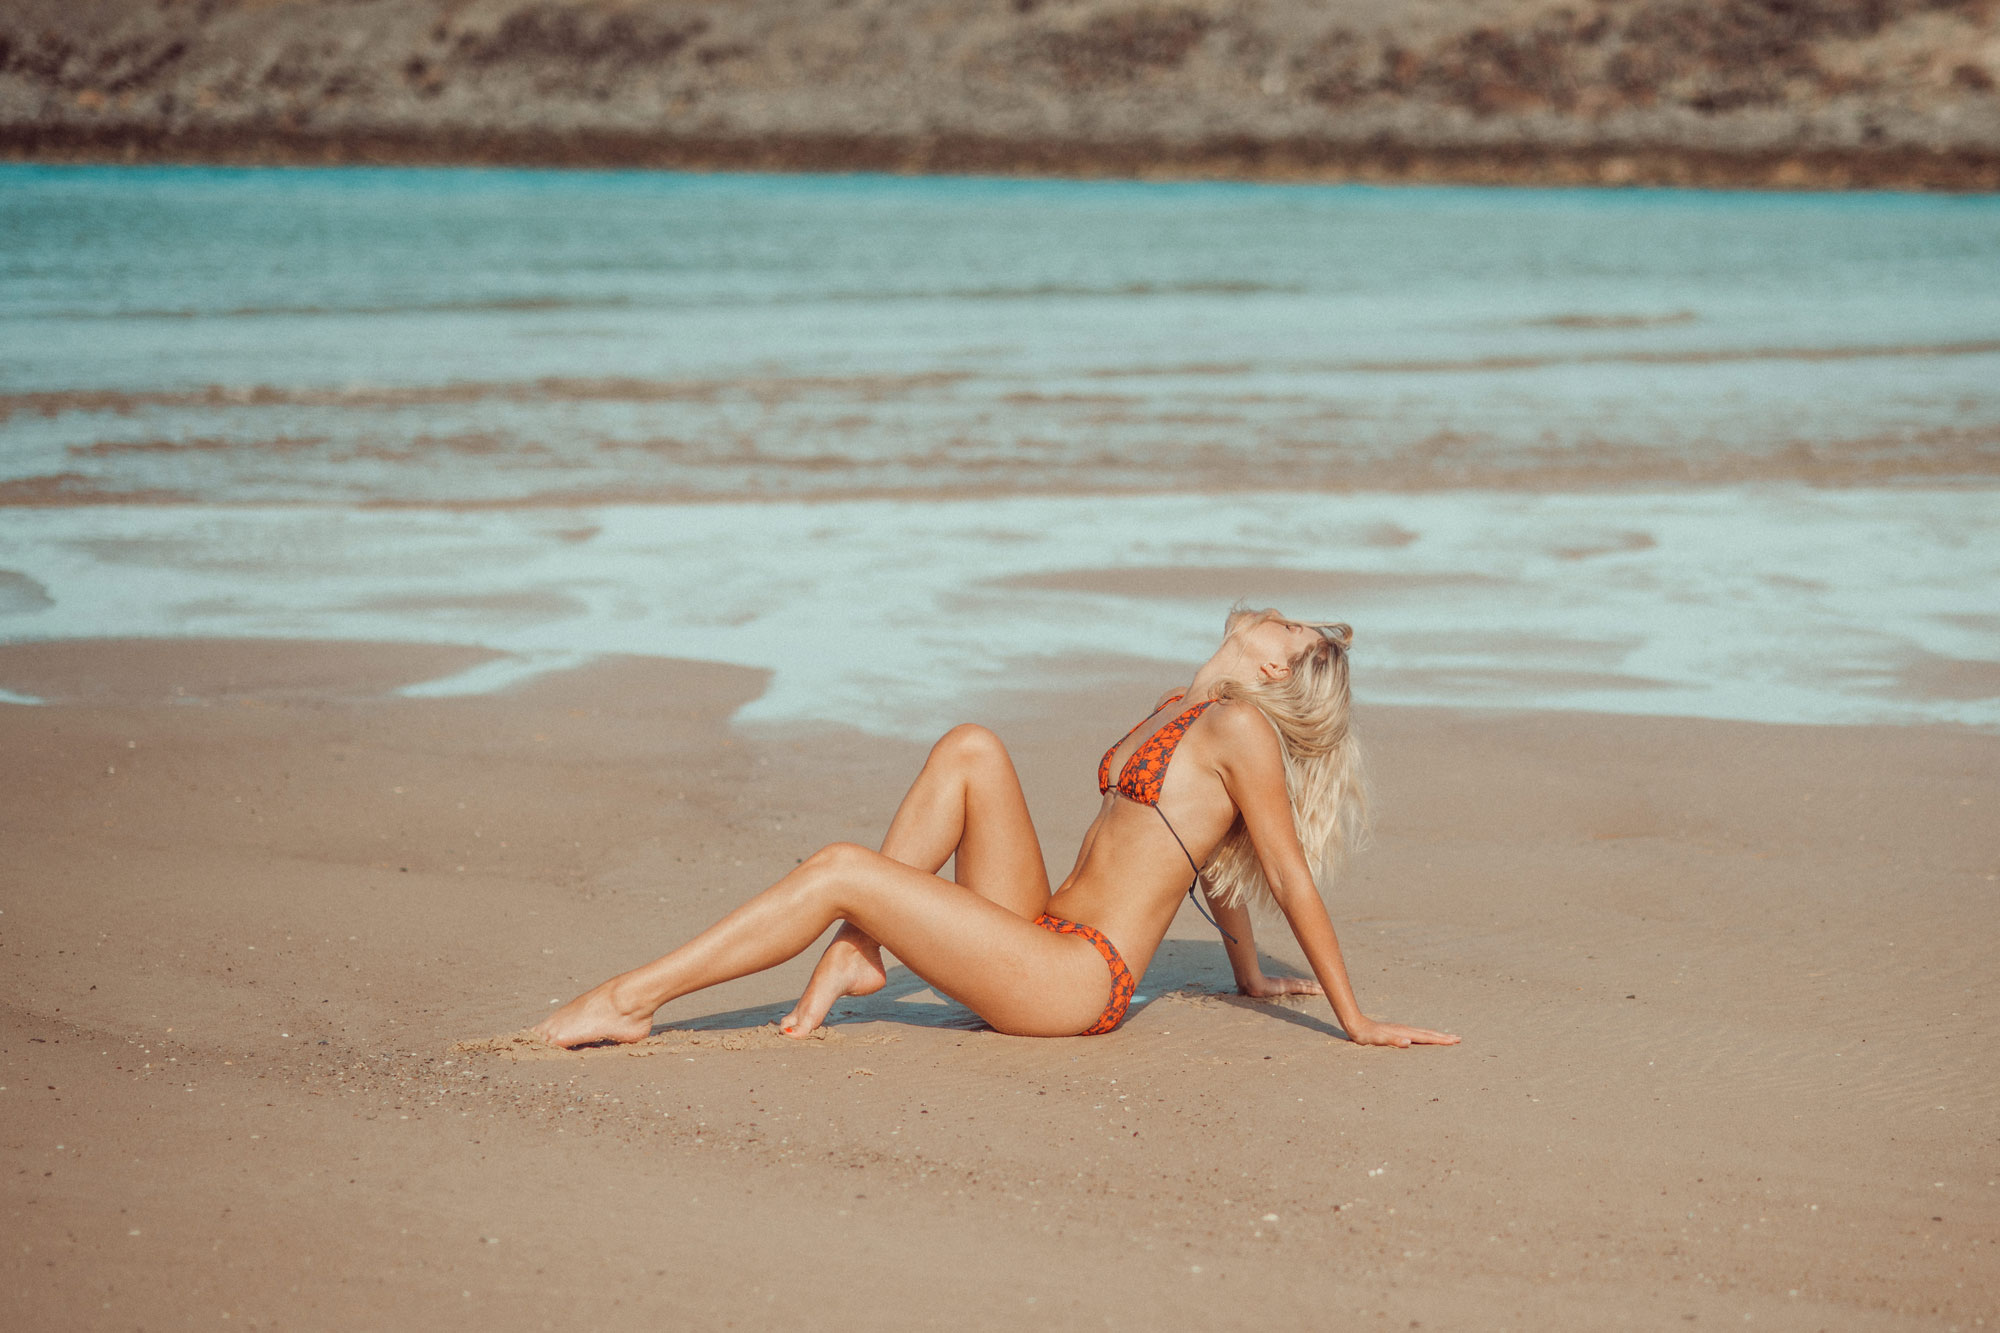 Ethical-Fashion-Glamour-Poppy-Red-Triangle-Bikini-Swimwear-Lily-Goodare-Gold-Coast-Model-by-Photographer-Kim-Akrigg-in-Liar-the-Label.jpg